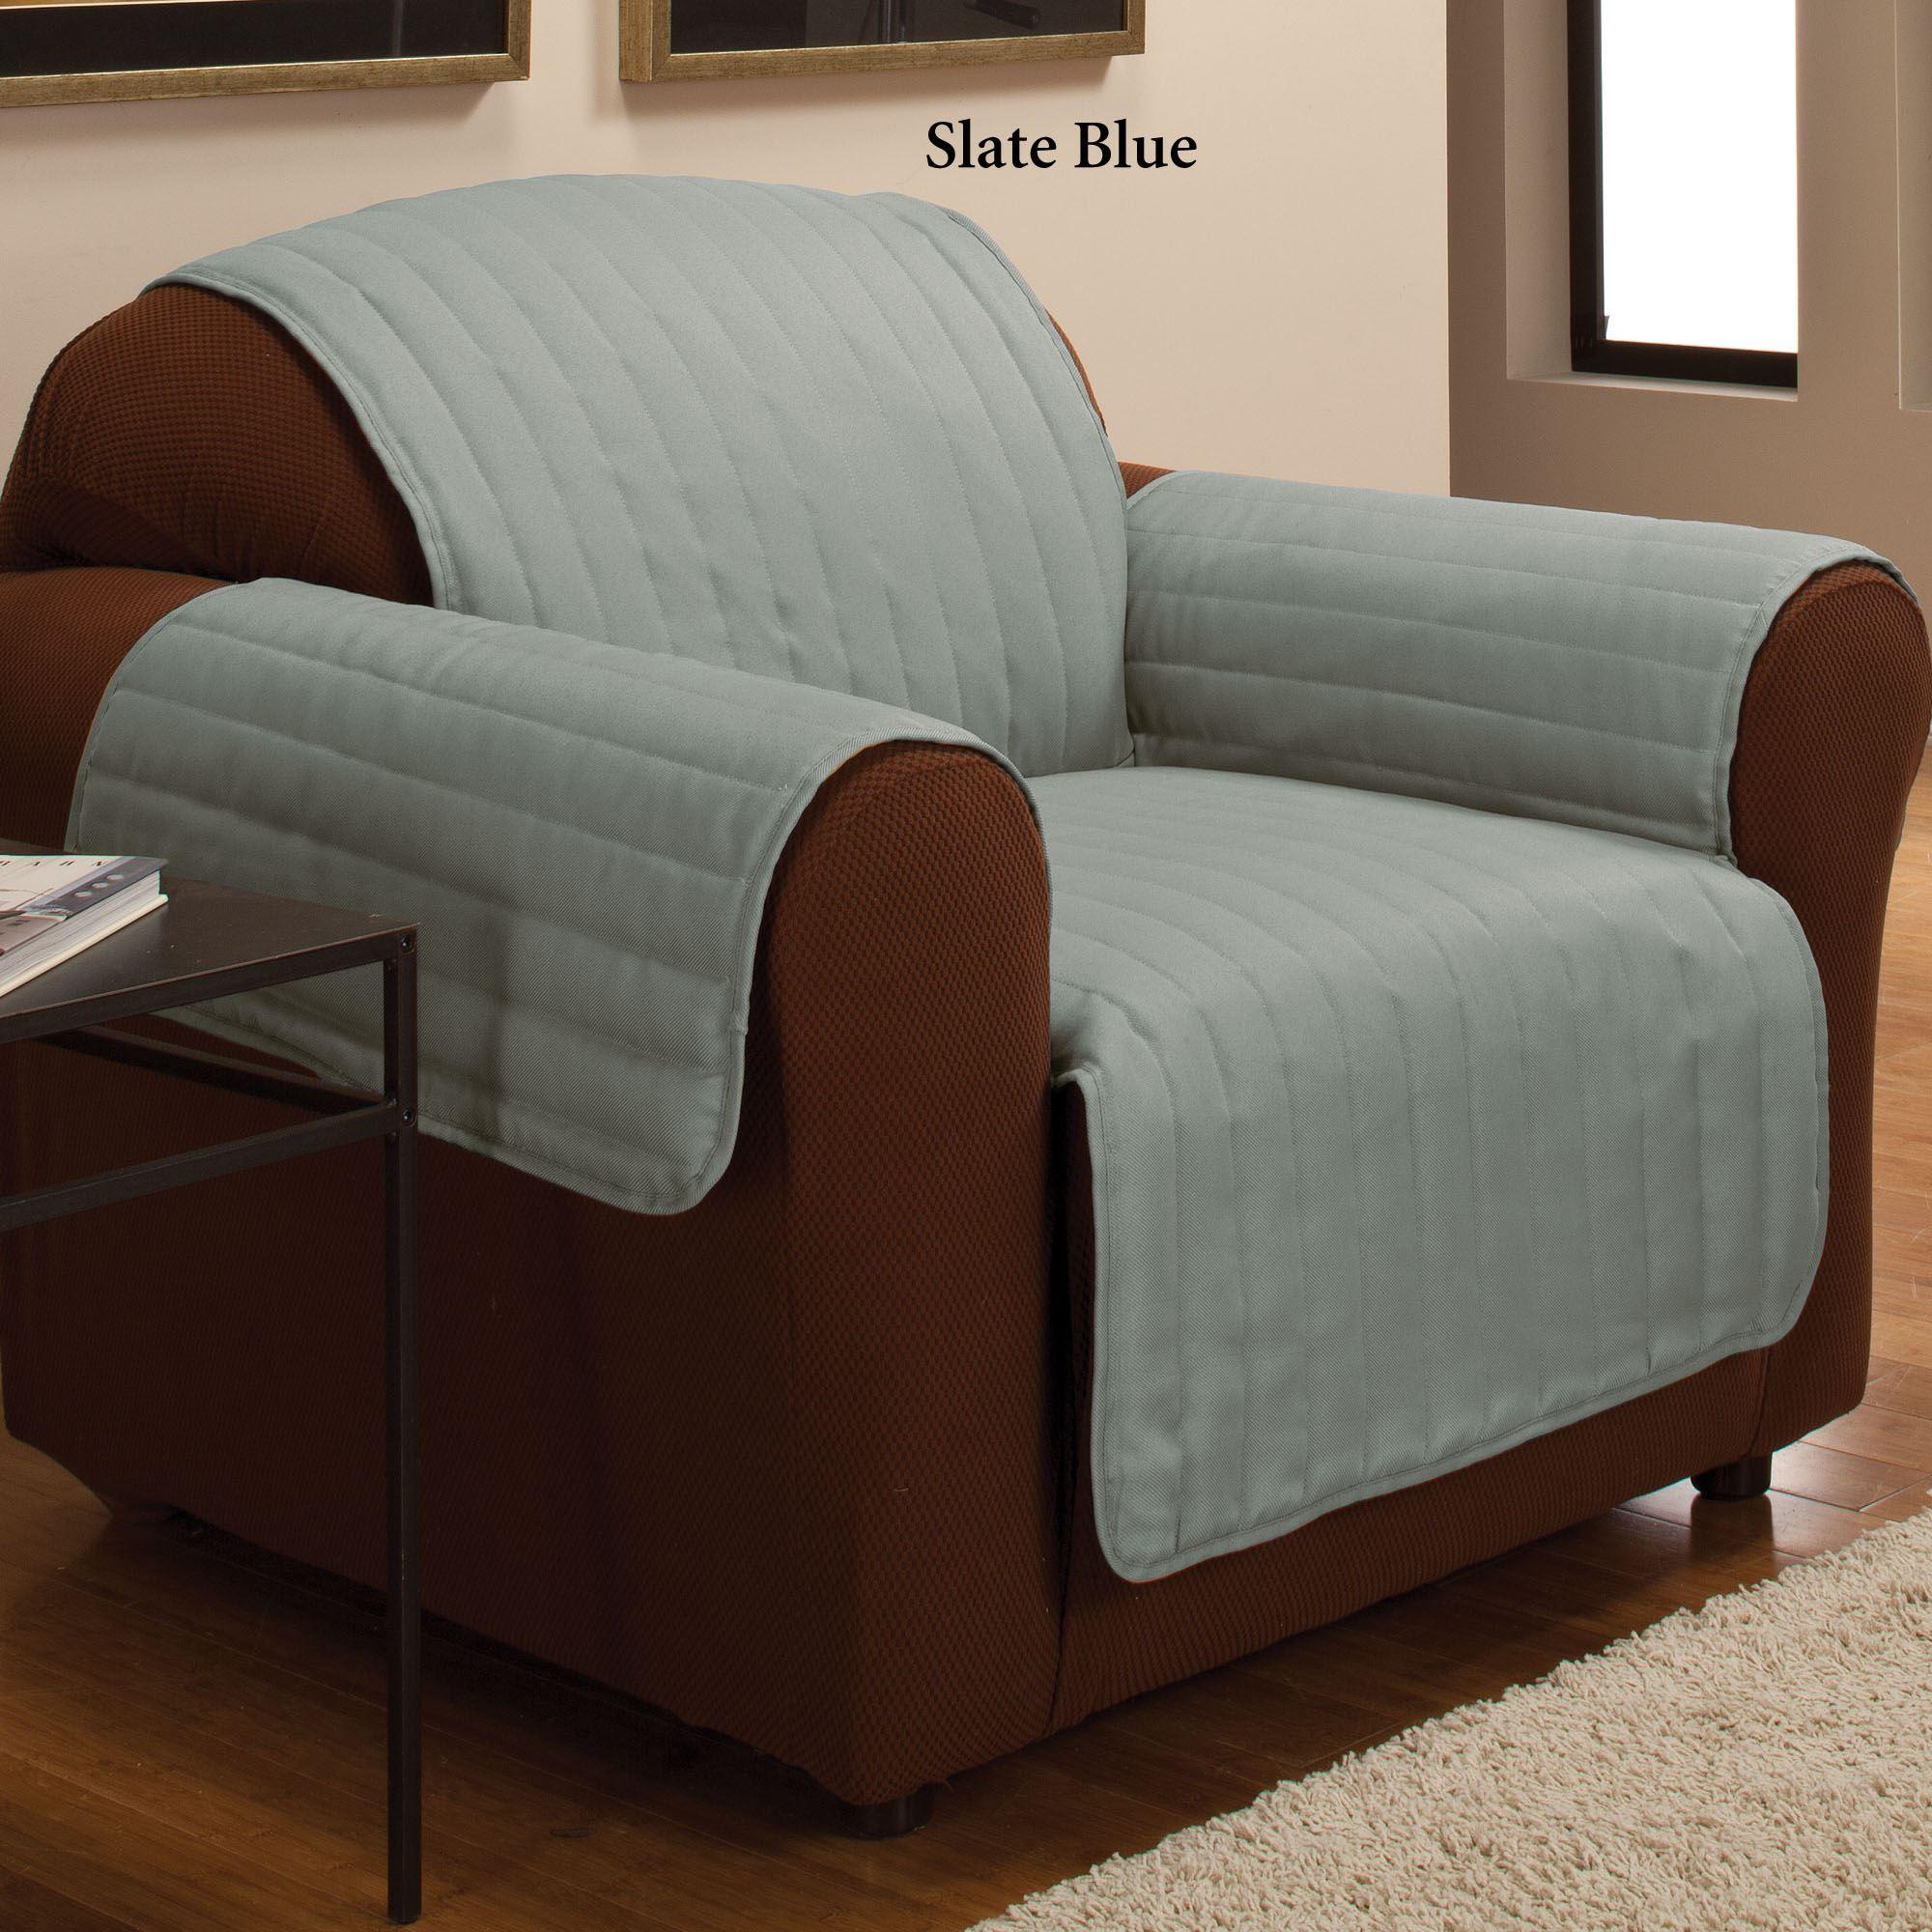 Twill Sofa Pet Furniture Cover